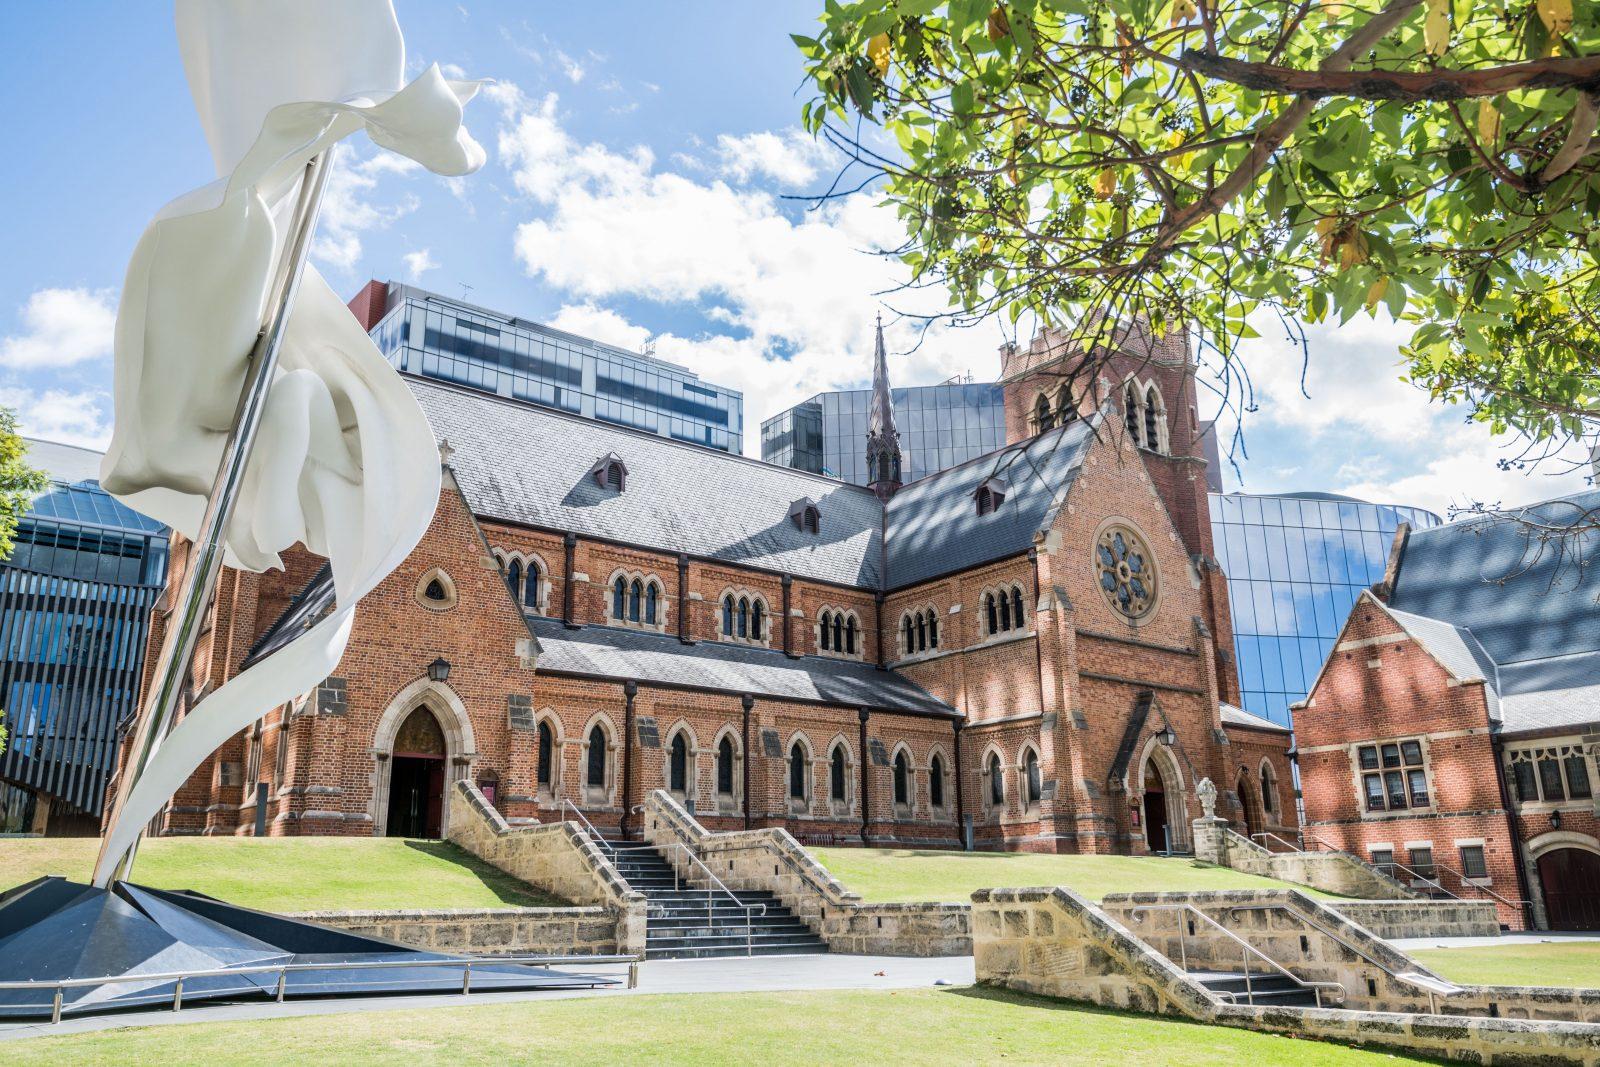 Cathedral Square, Perth, Western Australia